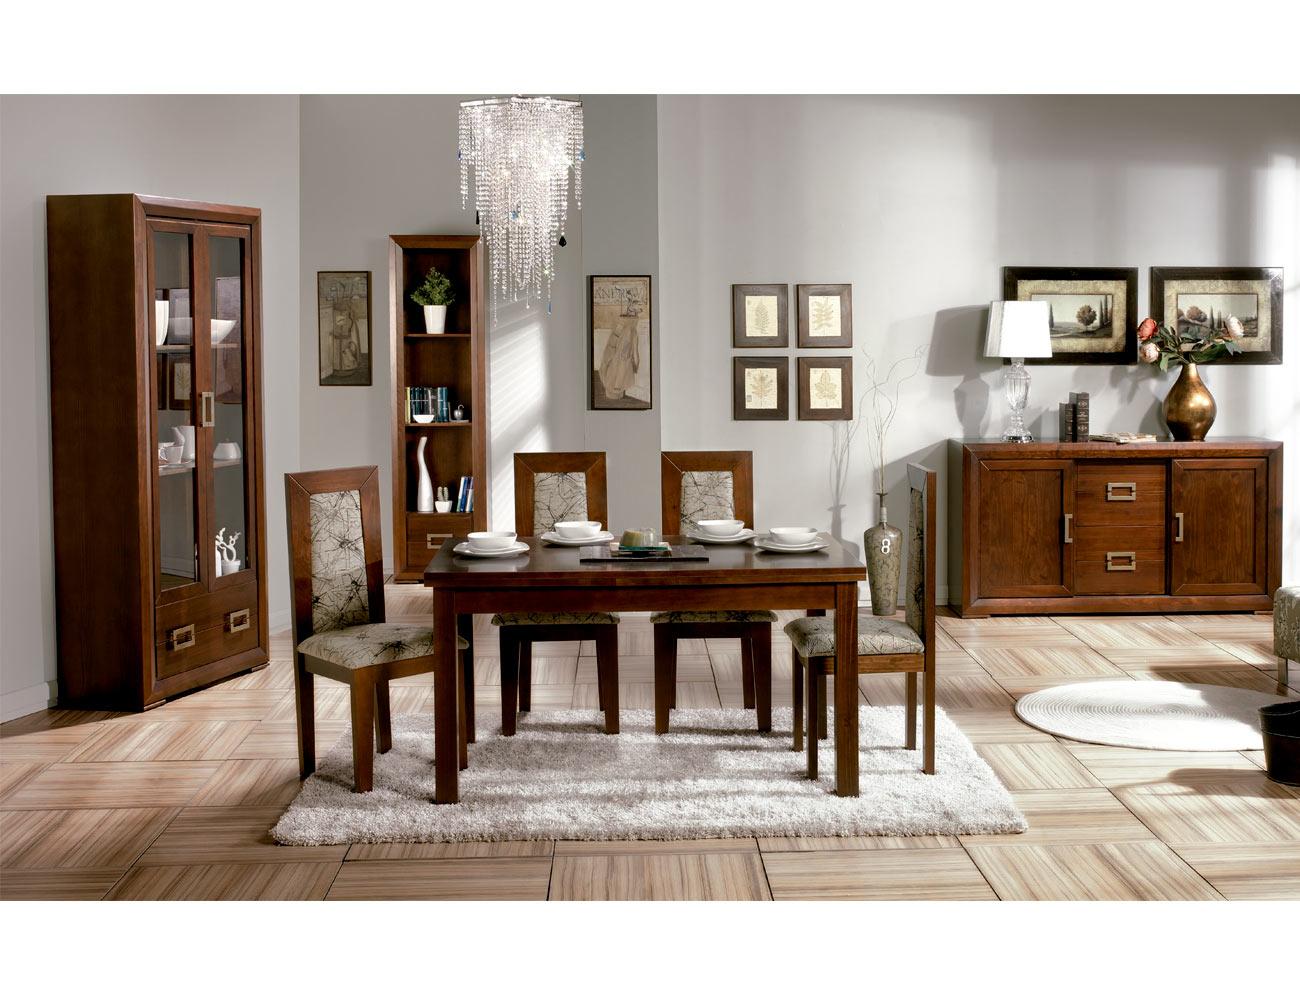 Composicion34 mueble salon comedor madera7